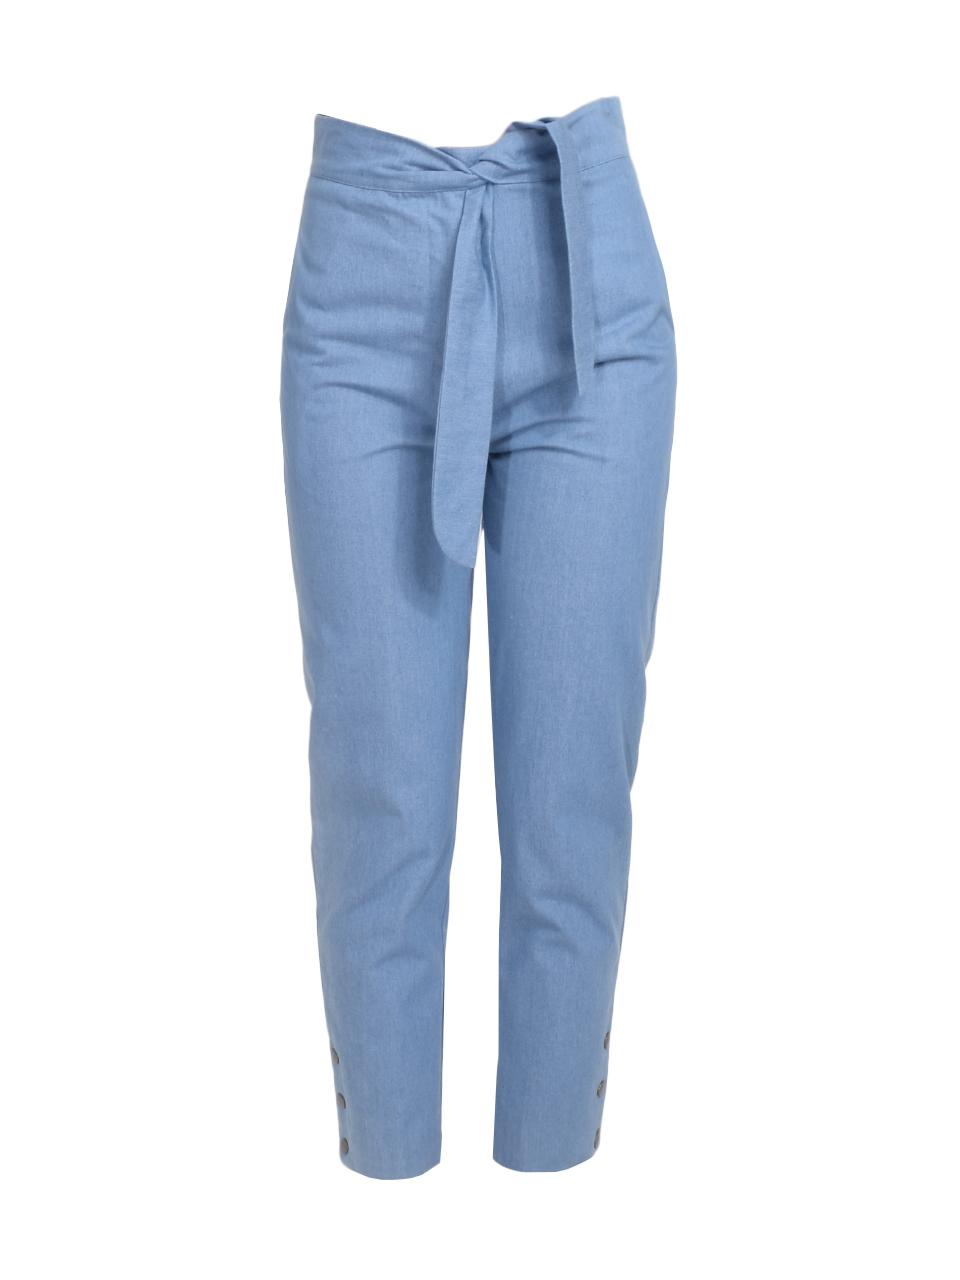 Karina Grimaldi Stella Denim Pants Product Shot